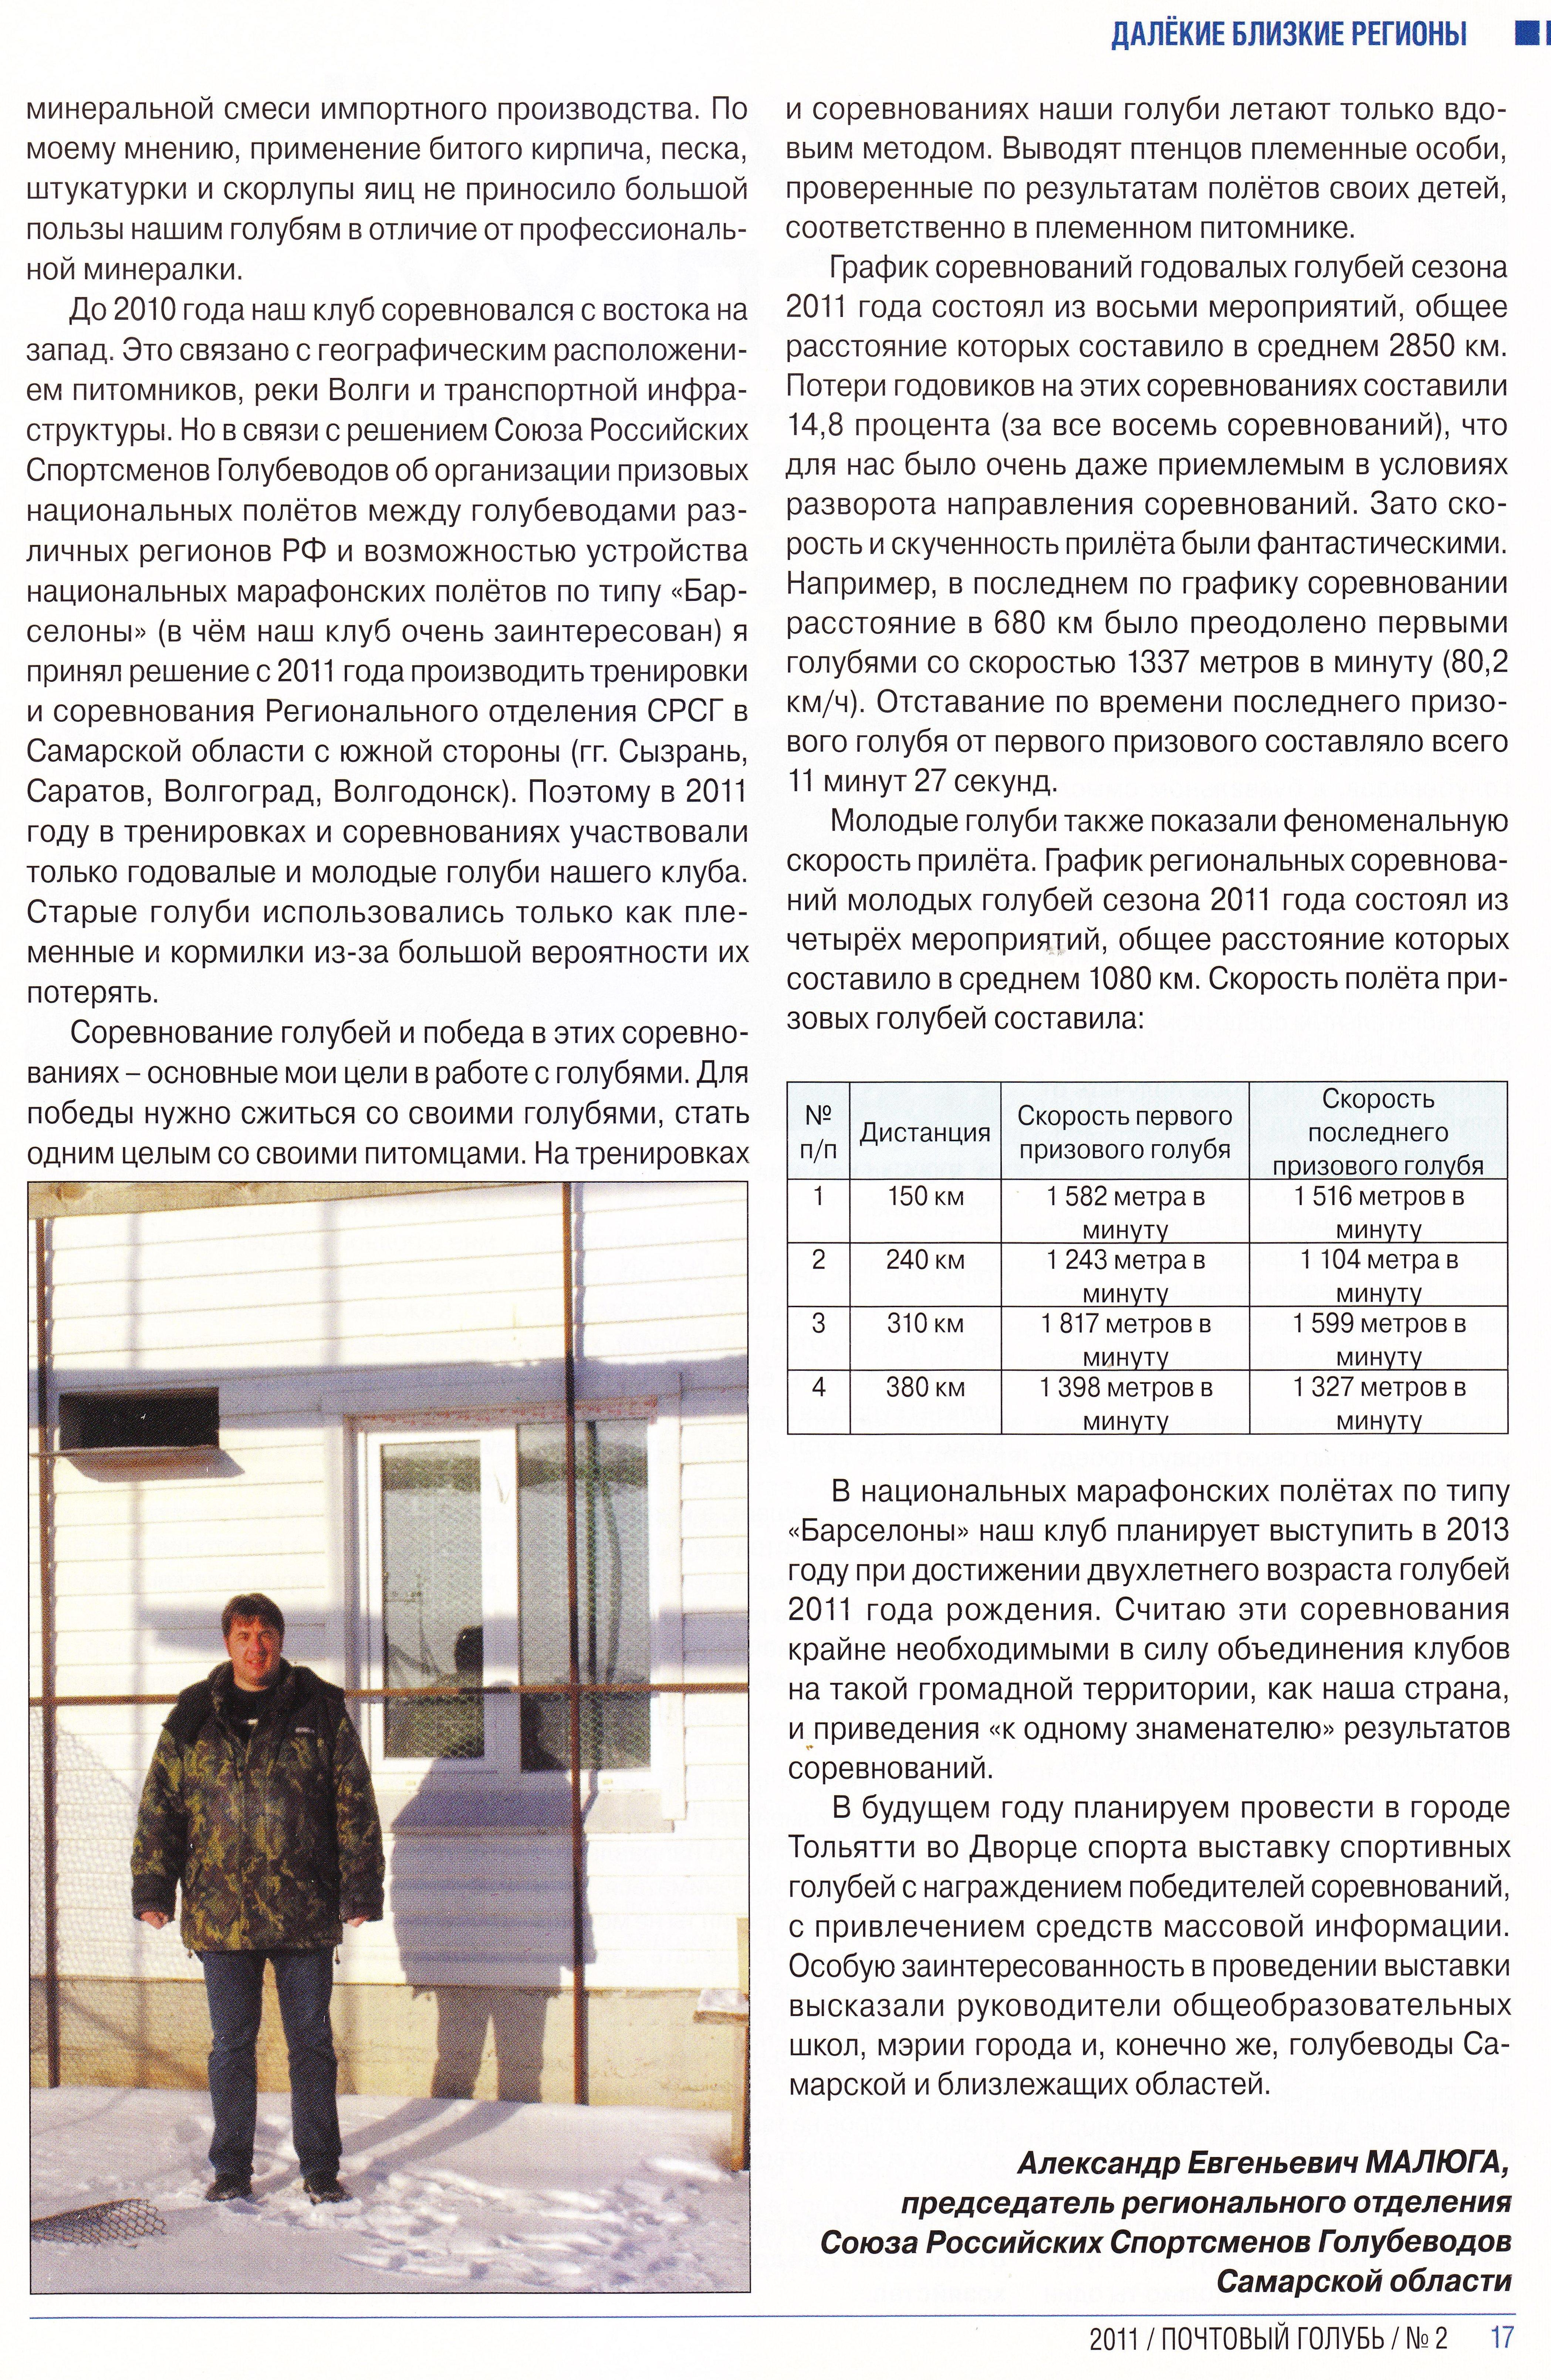 http://forumupload.ru/uploads/0012/5a/ef/2/473952.jpg